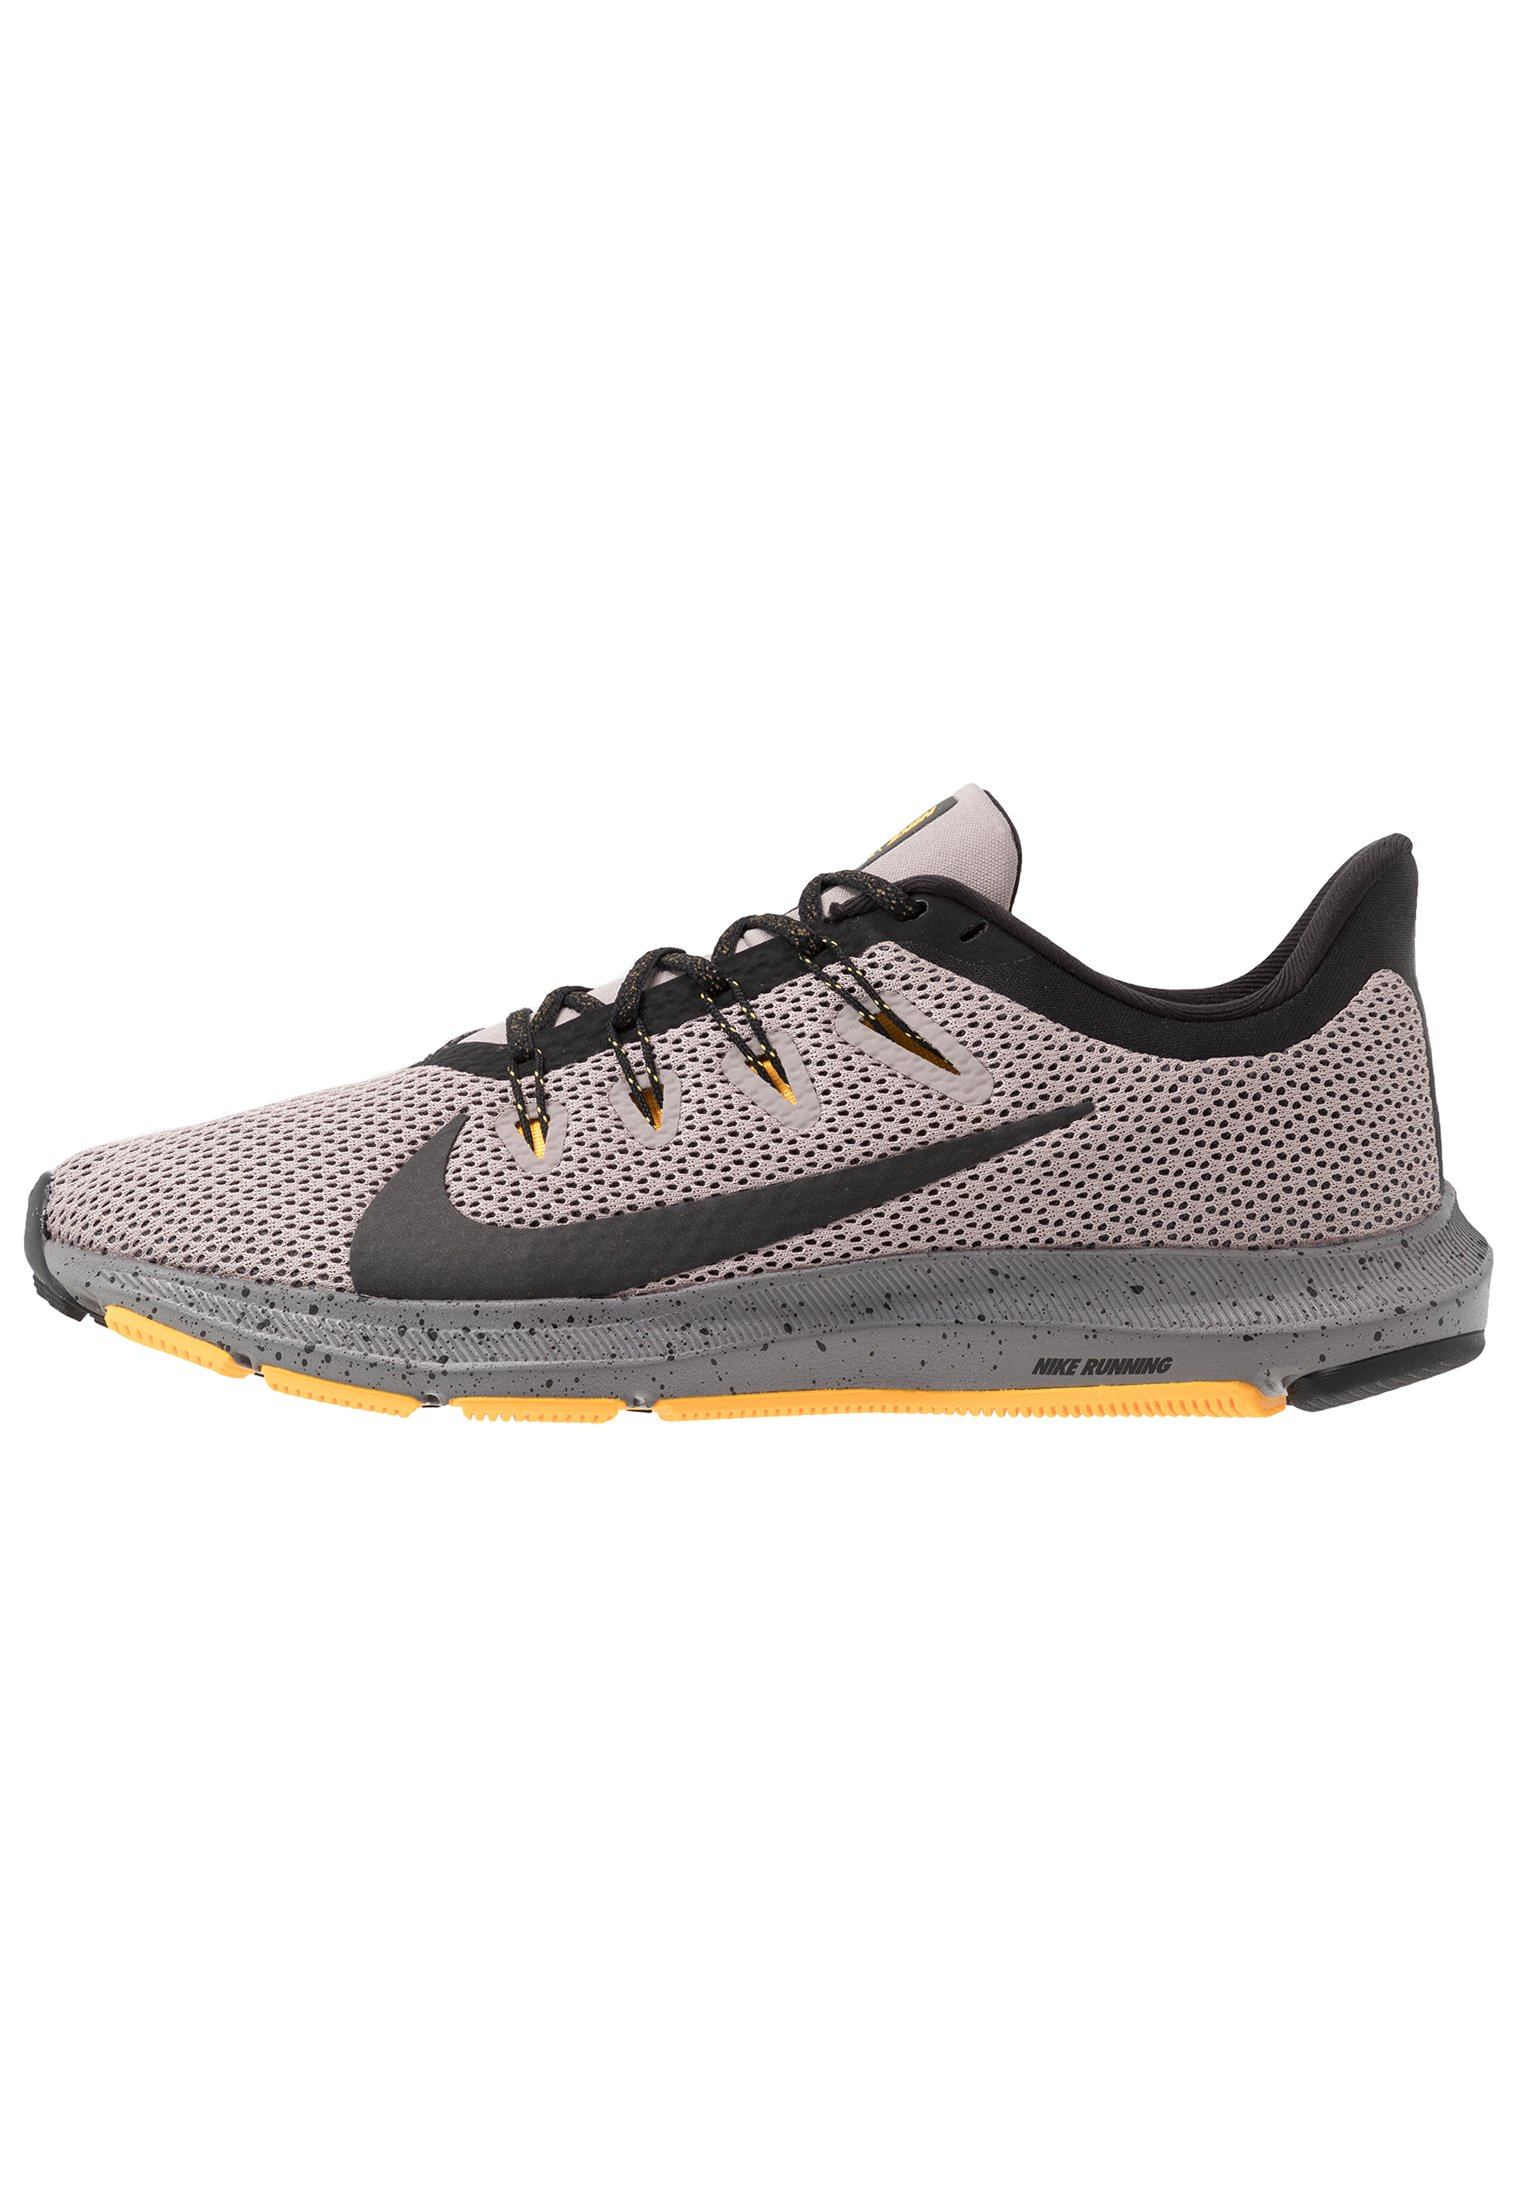 QUEST 2 SE Chaussures de running neutres pumiceblackrust pinklaser orange